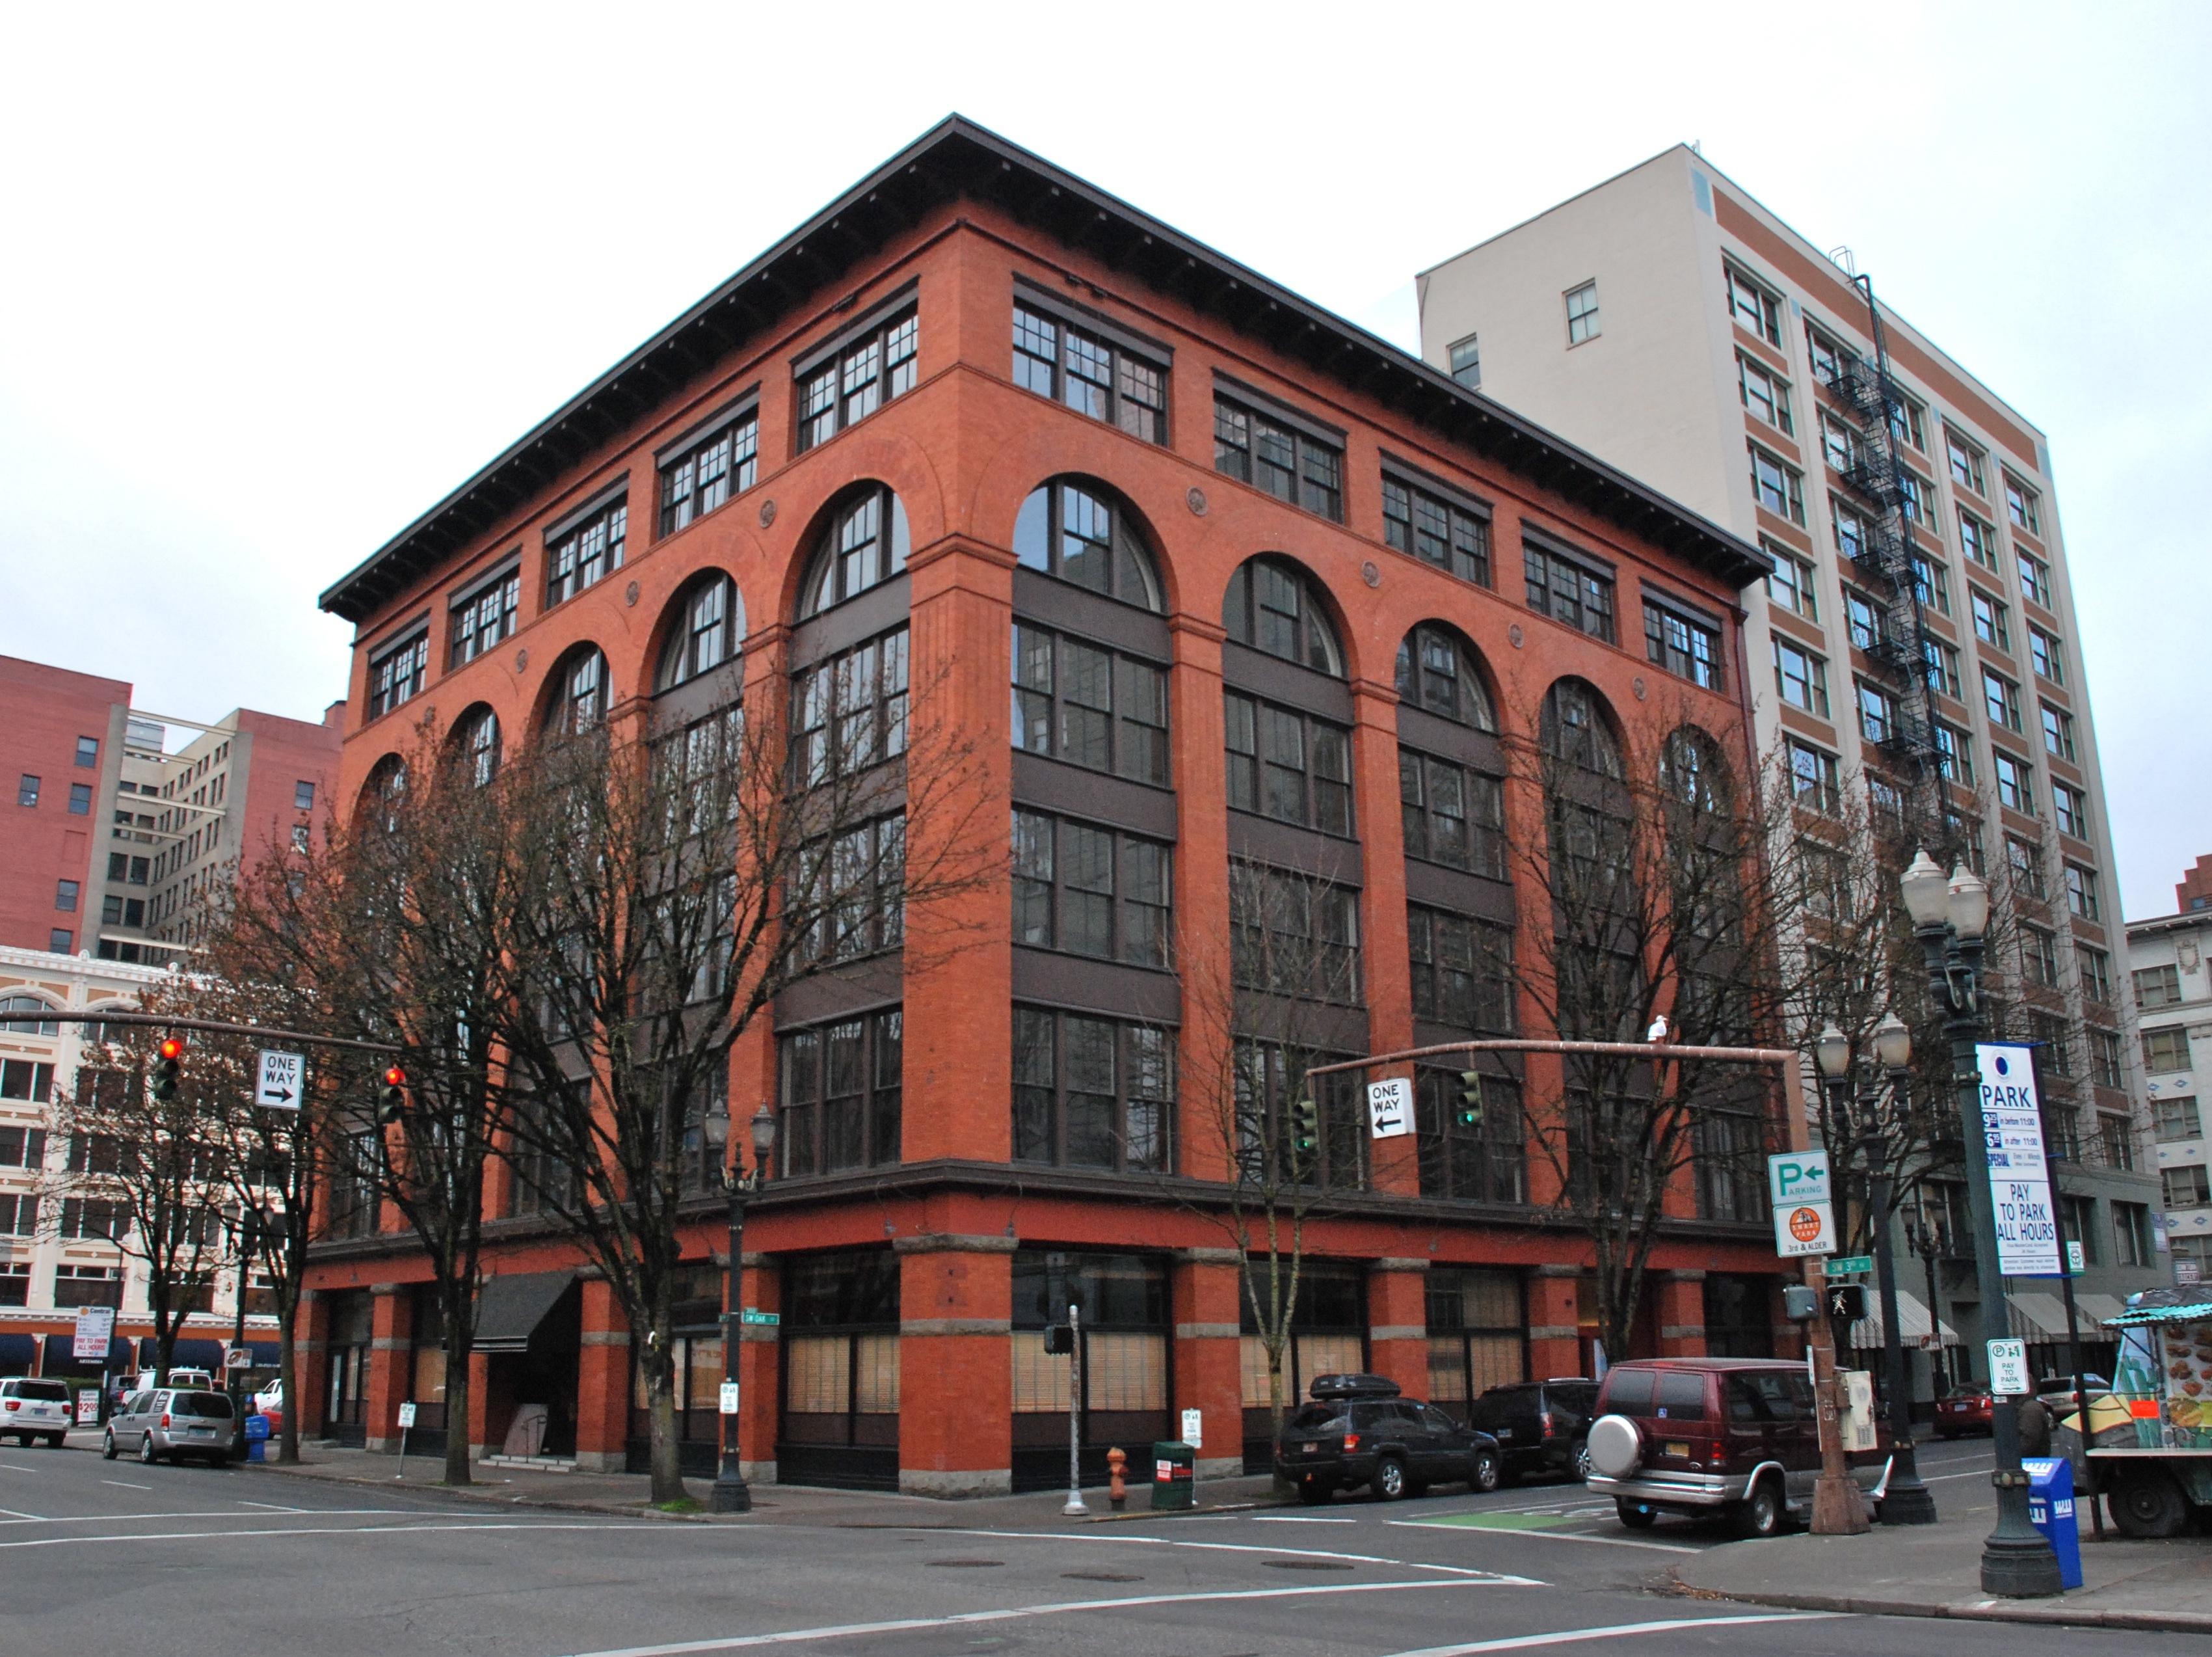 28 file ormonde apartment building portland file for Building a house in portland oregon